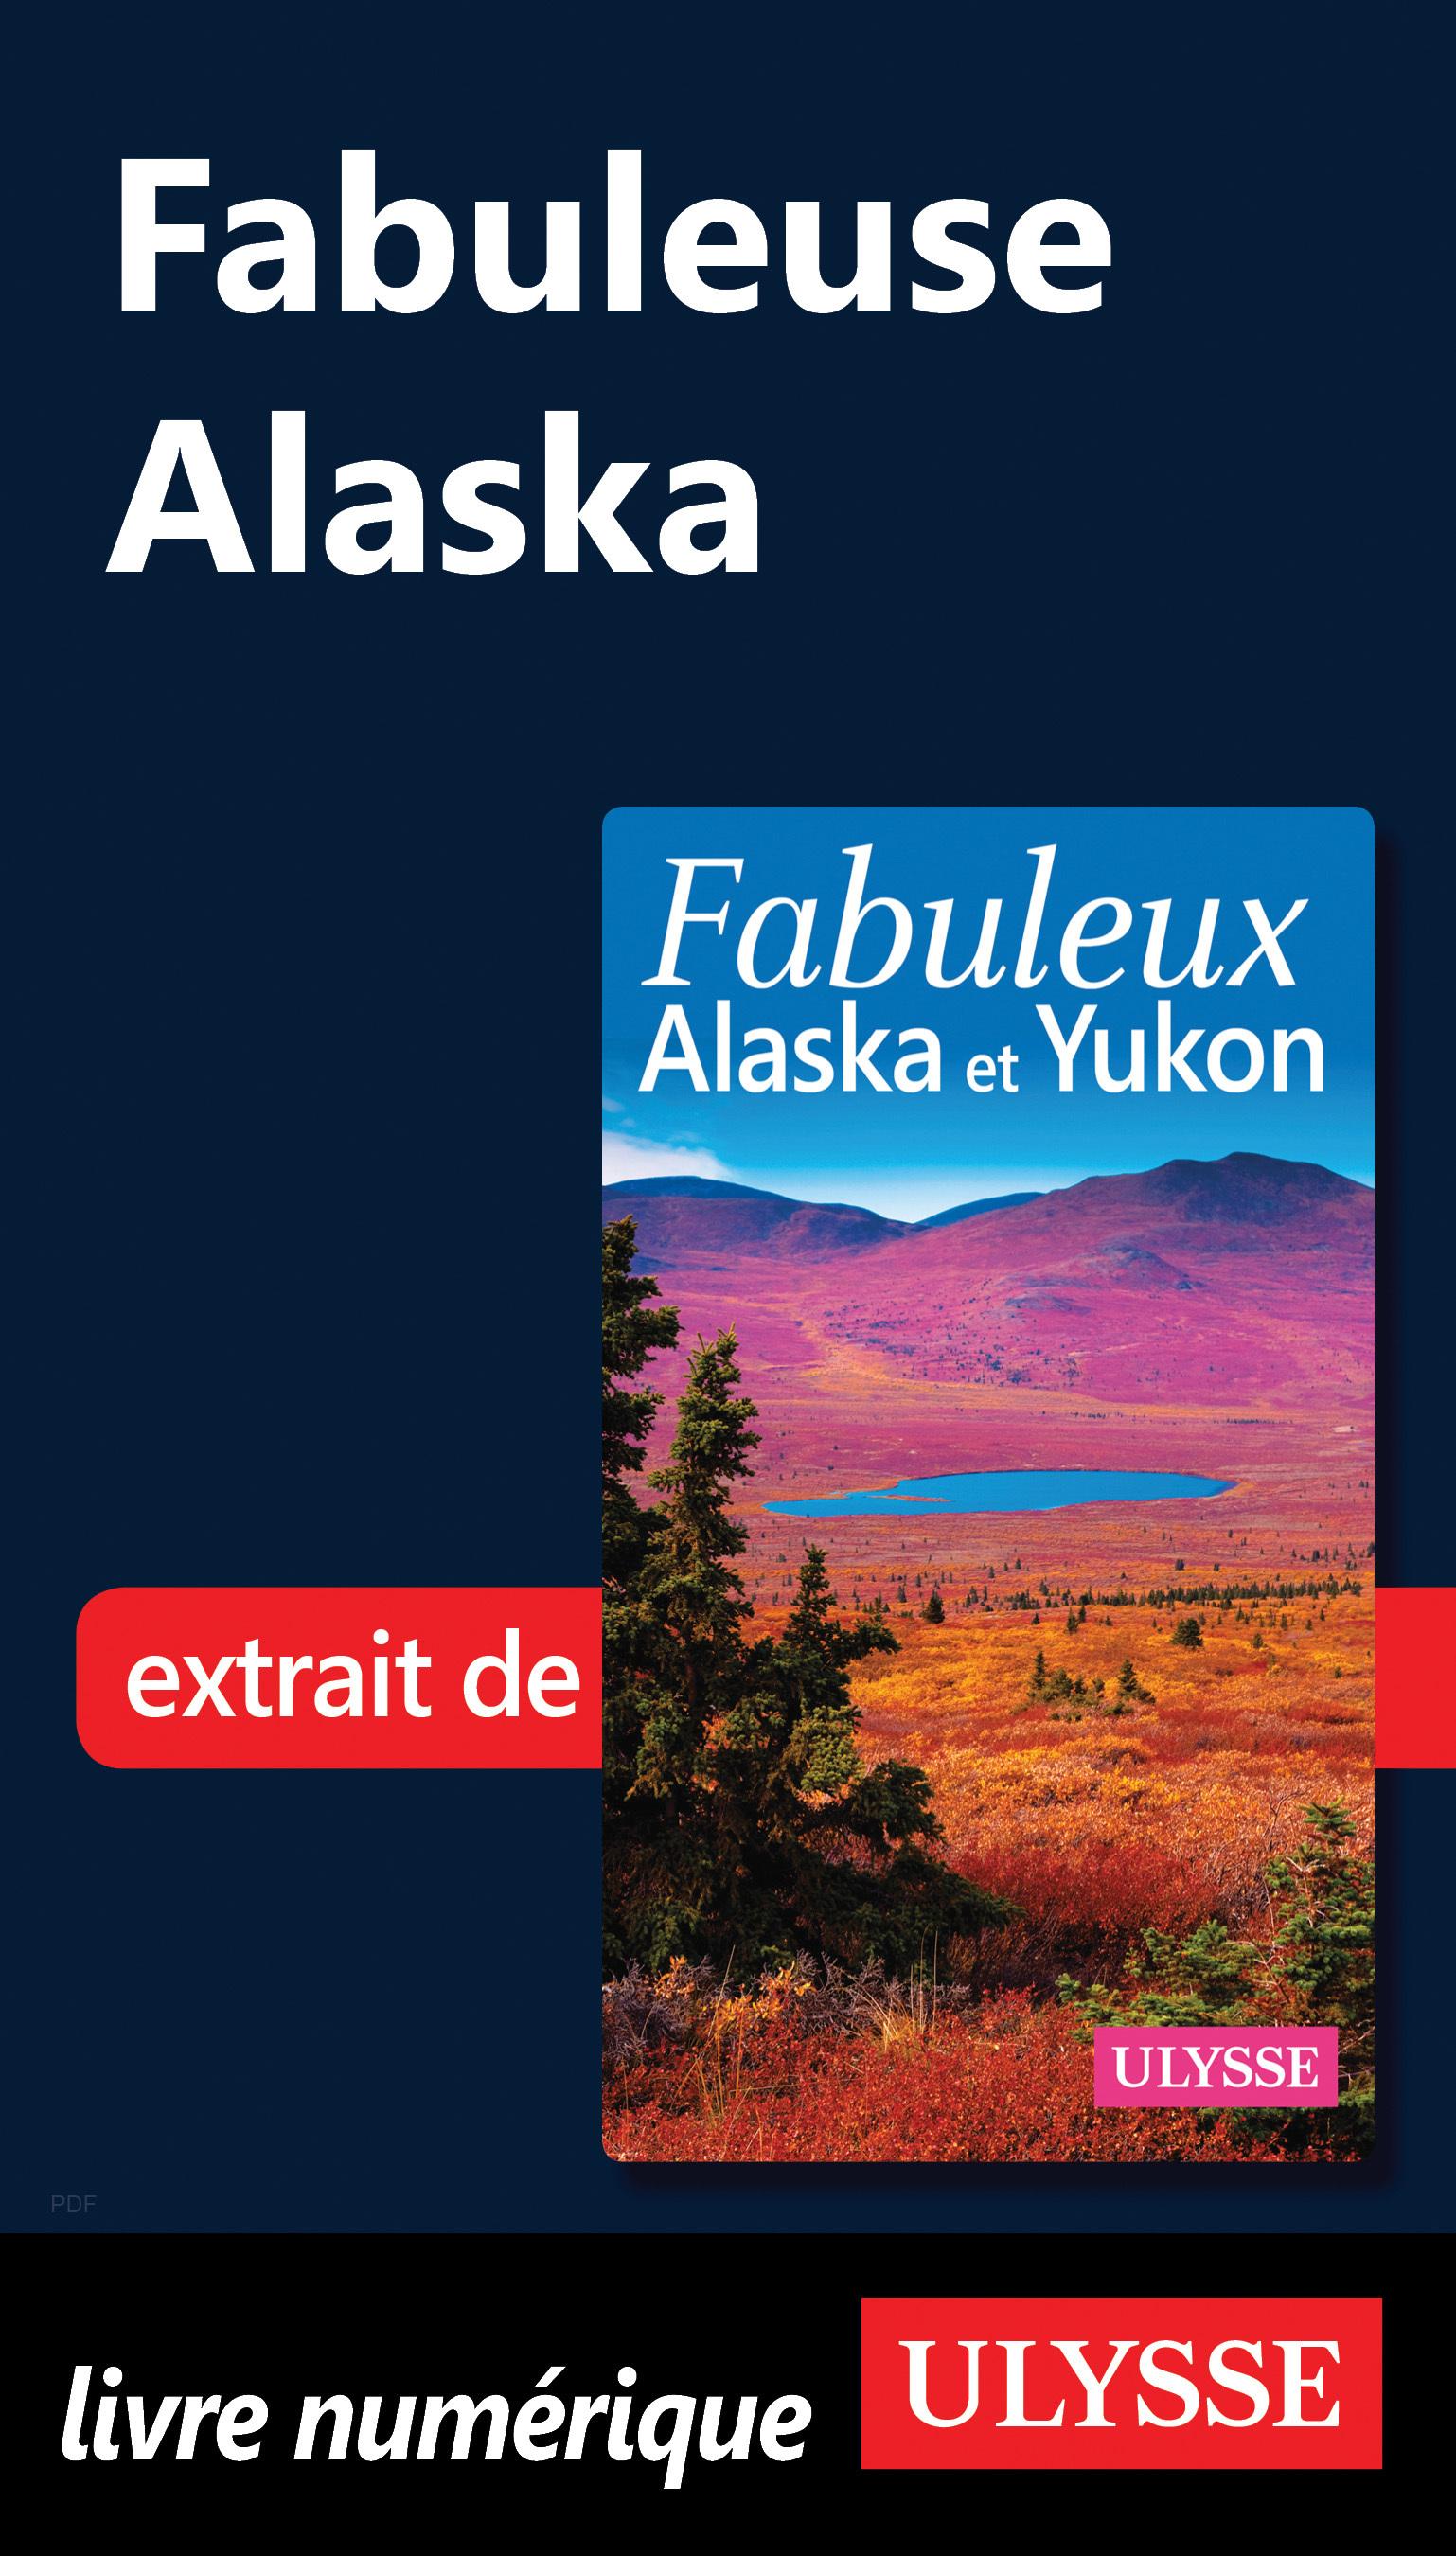 Fabuleuse Alaska